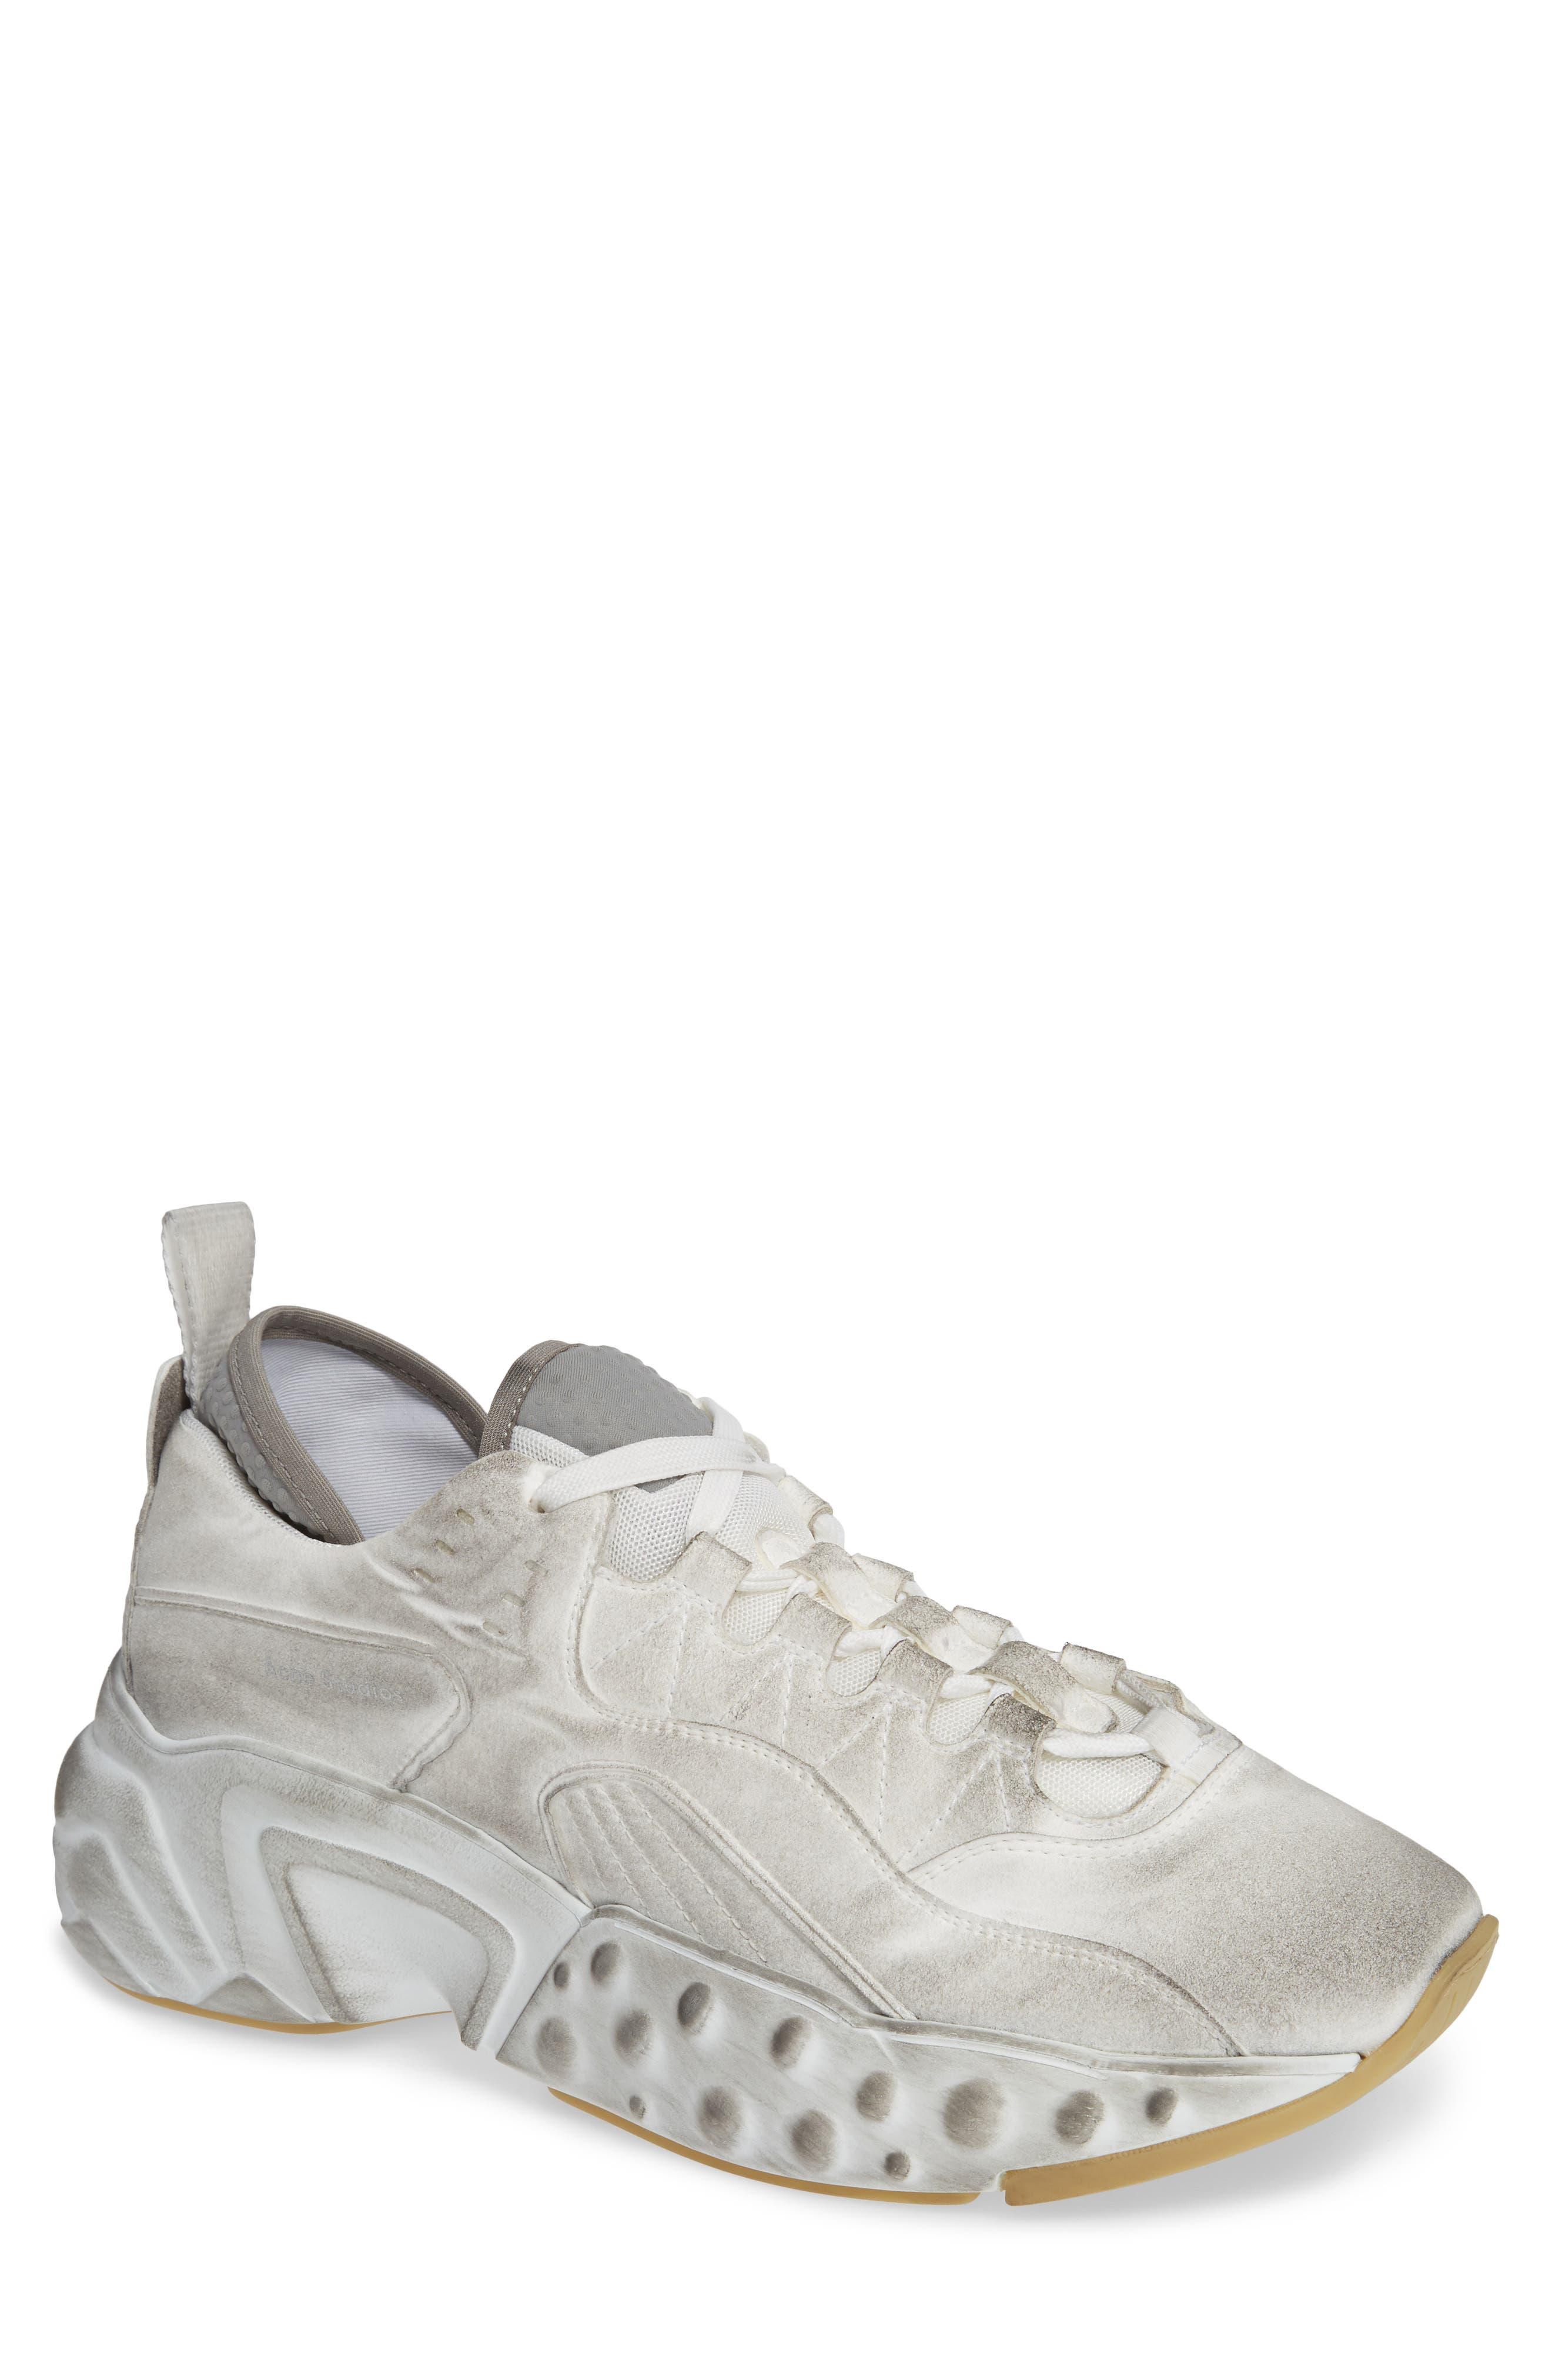 Rockaway Built-Up Sneaker,                         Main,                         color, WHITE